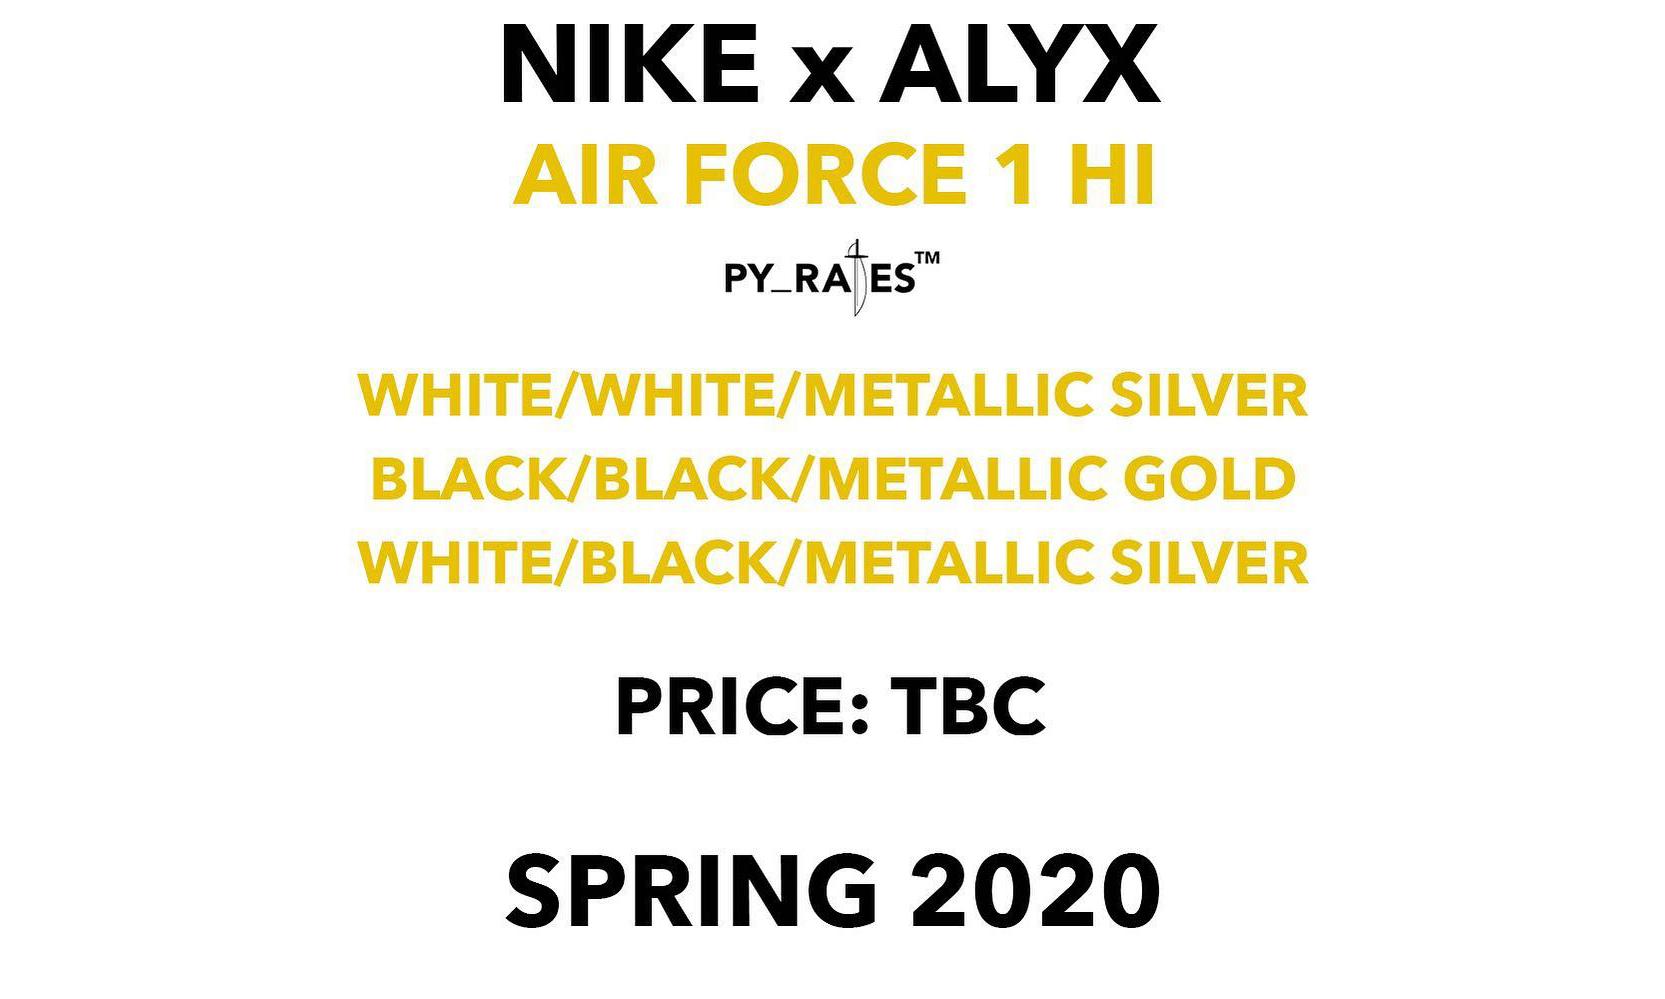 Nike 与 ALYX 还将在 2020 年推出 3 款联名 Air Force 1